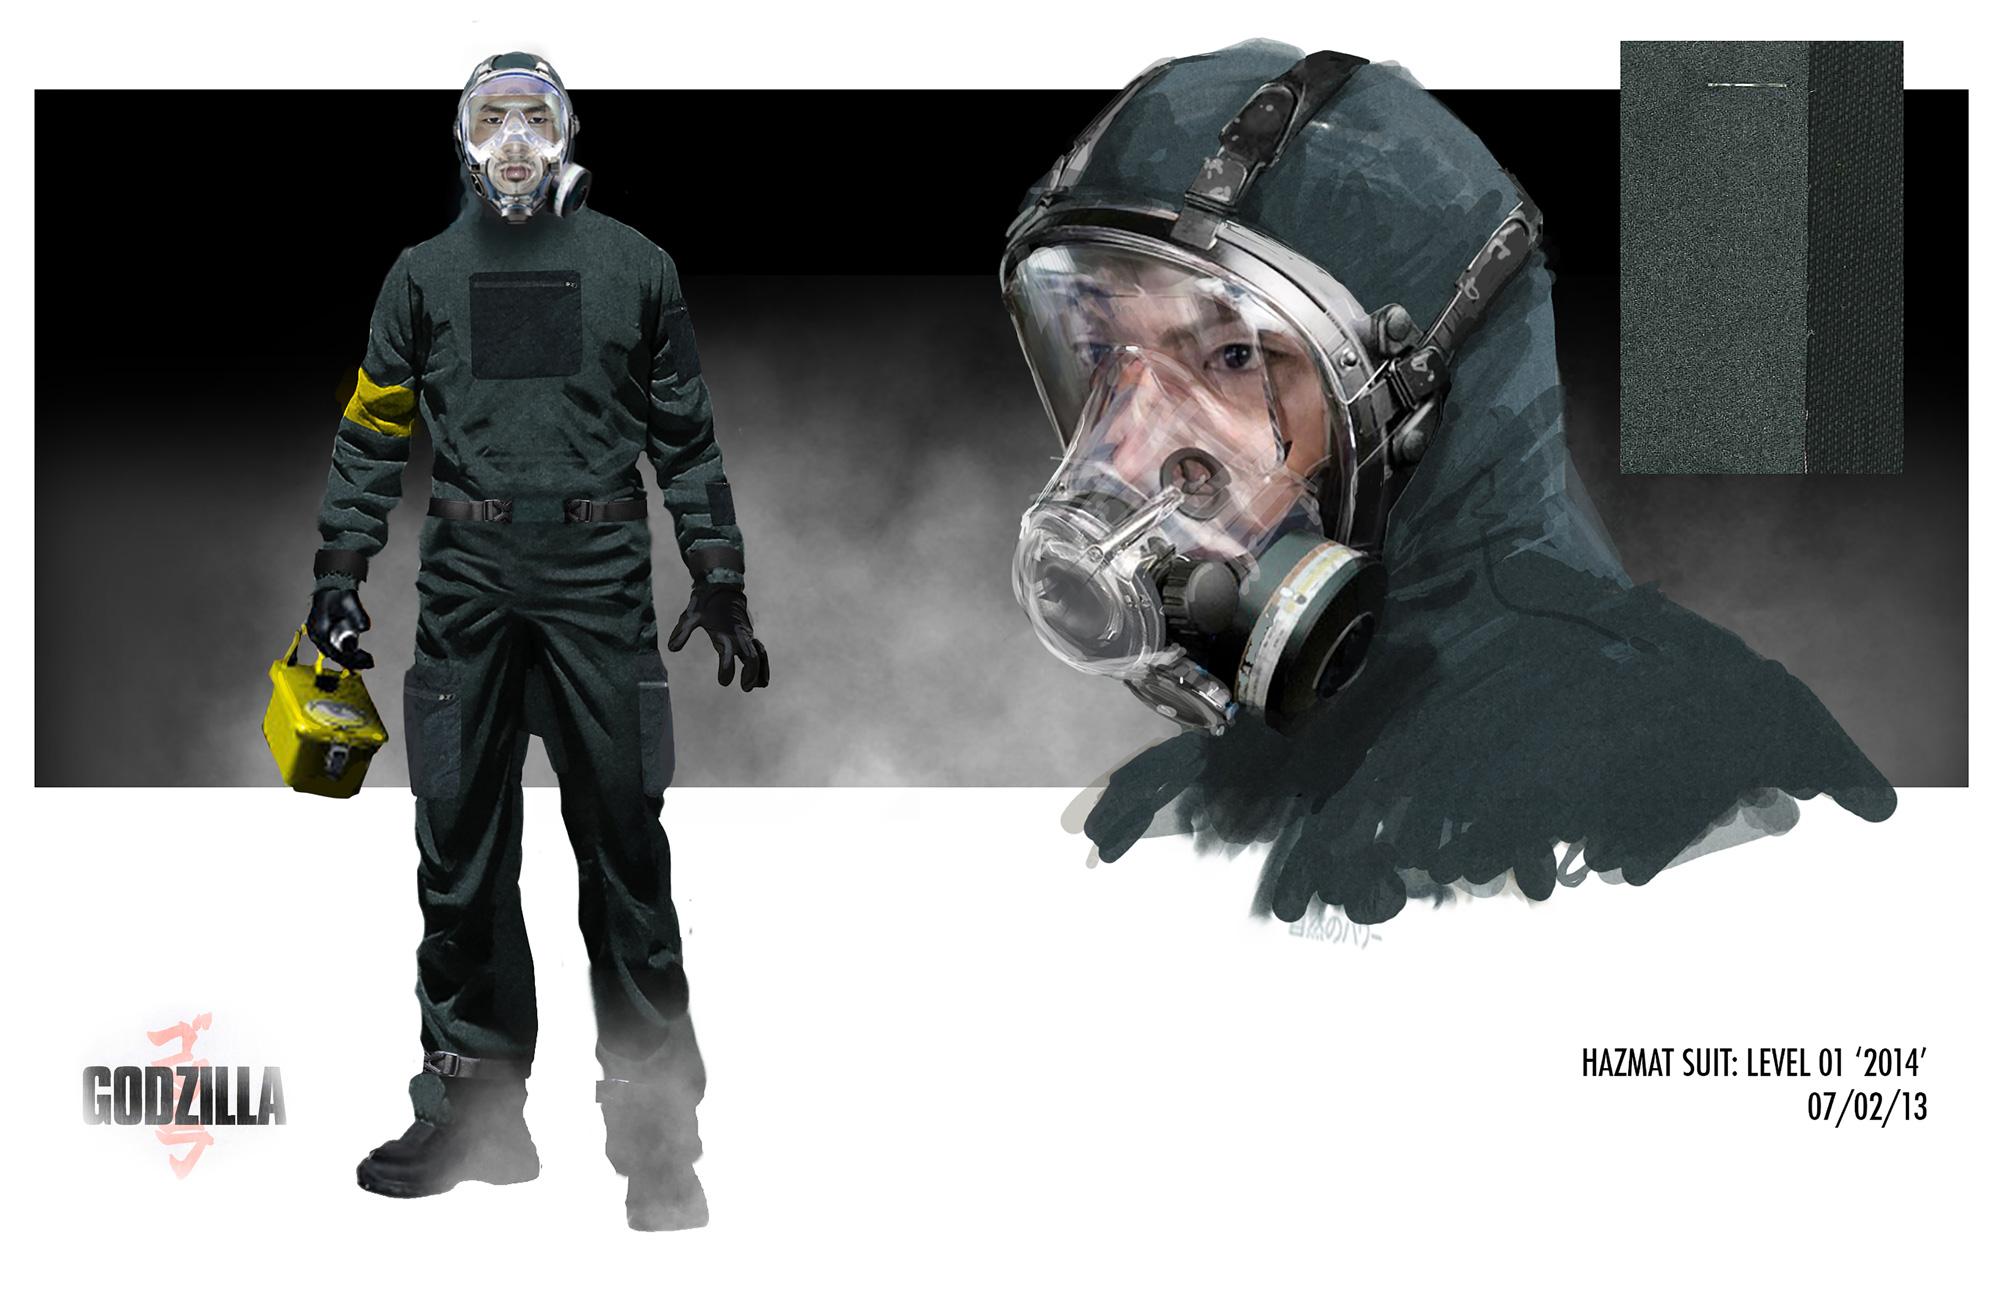 Godzilla Concept Art by Warren Flanagan